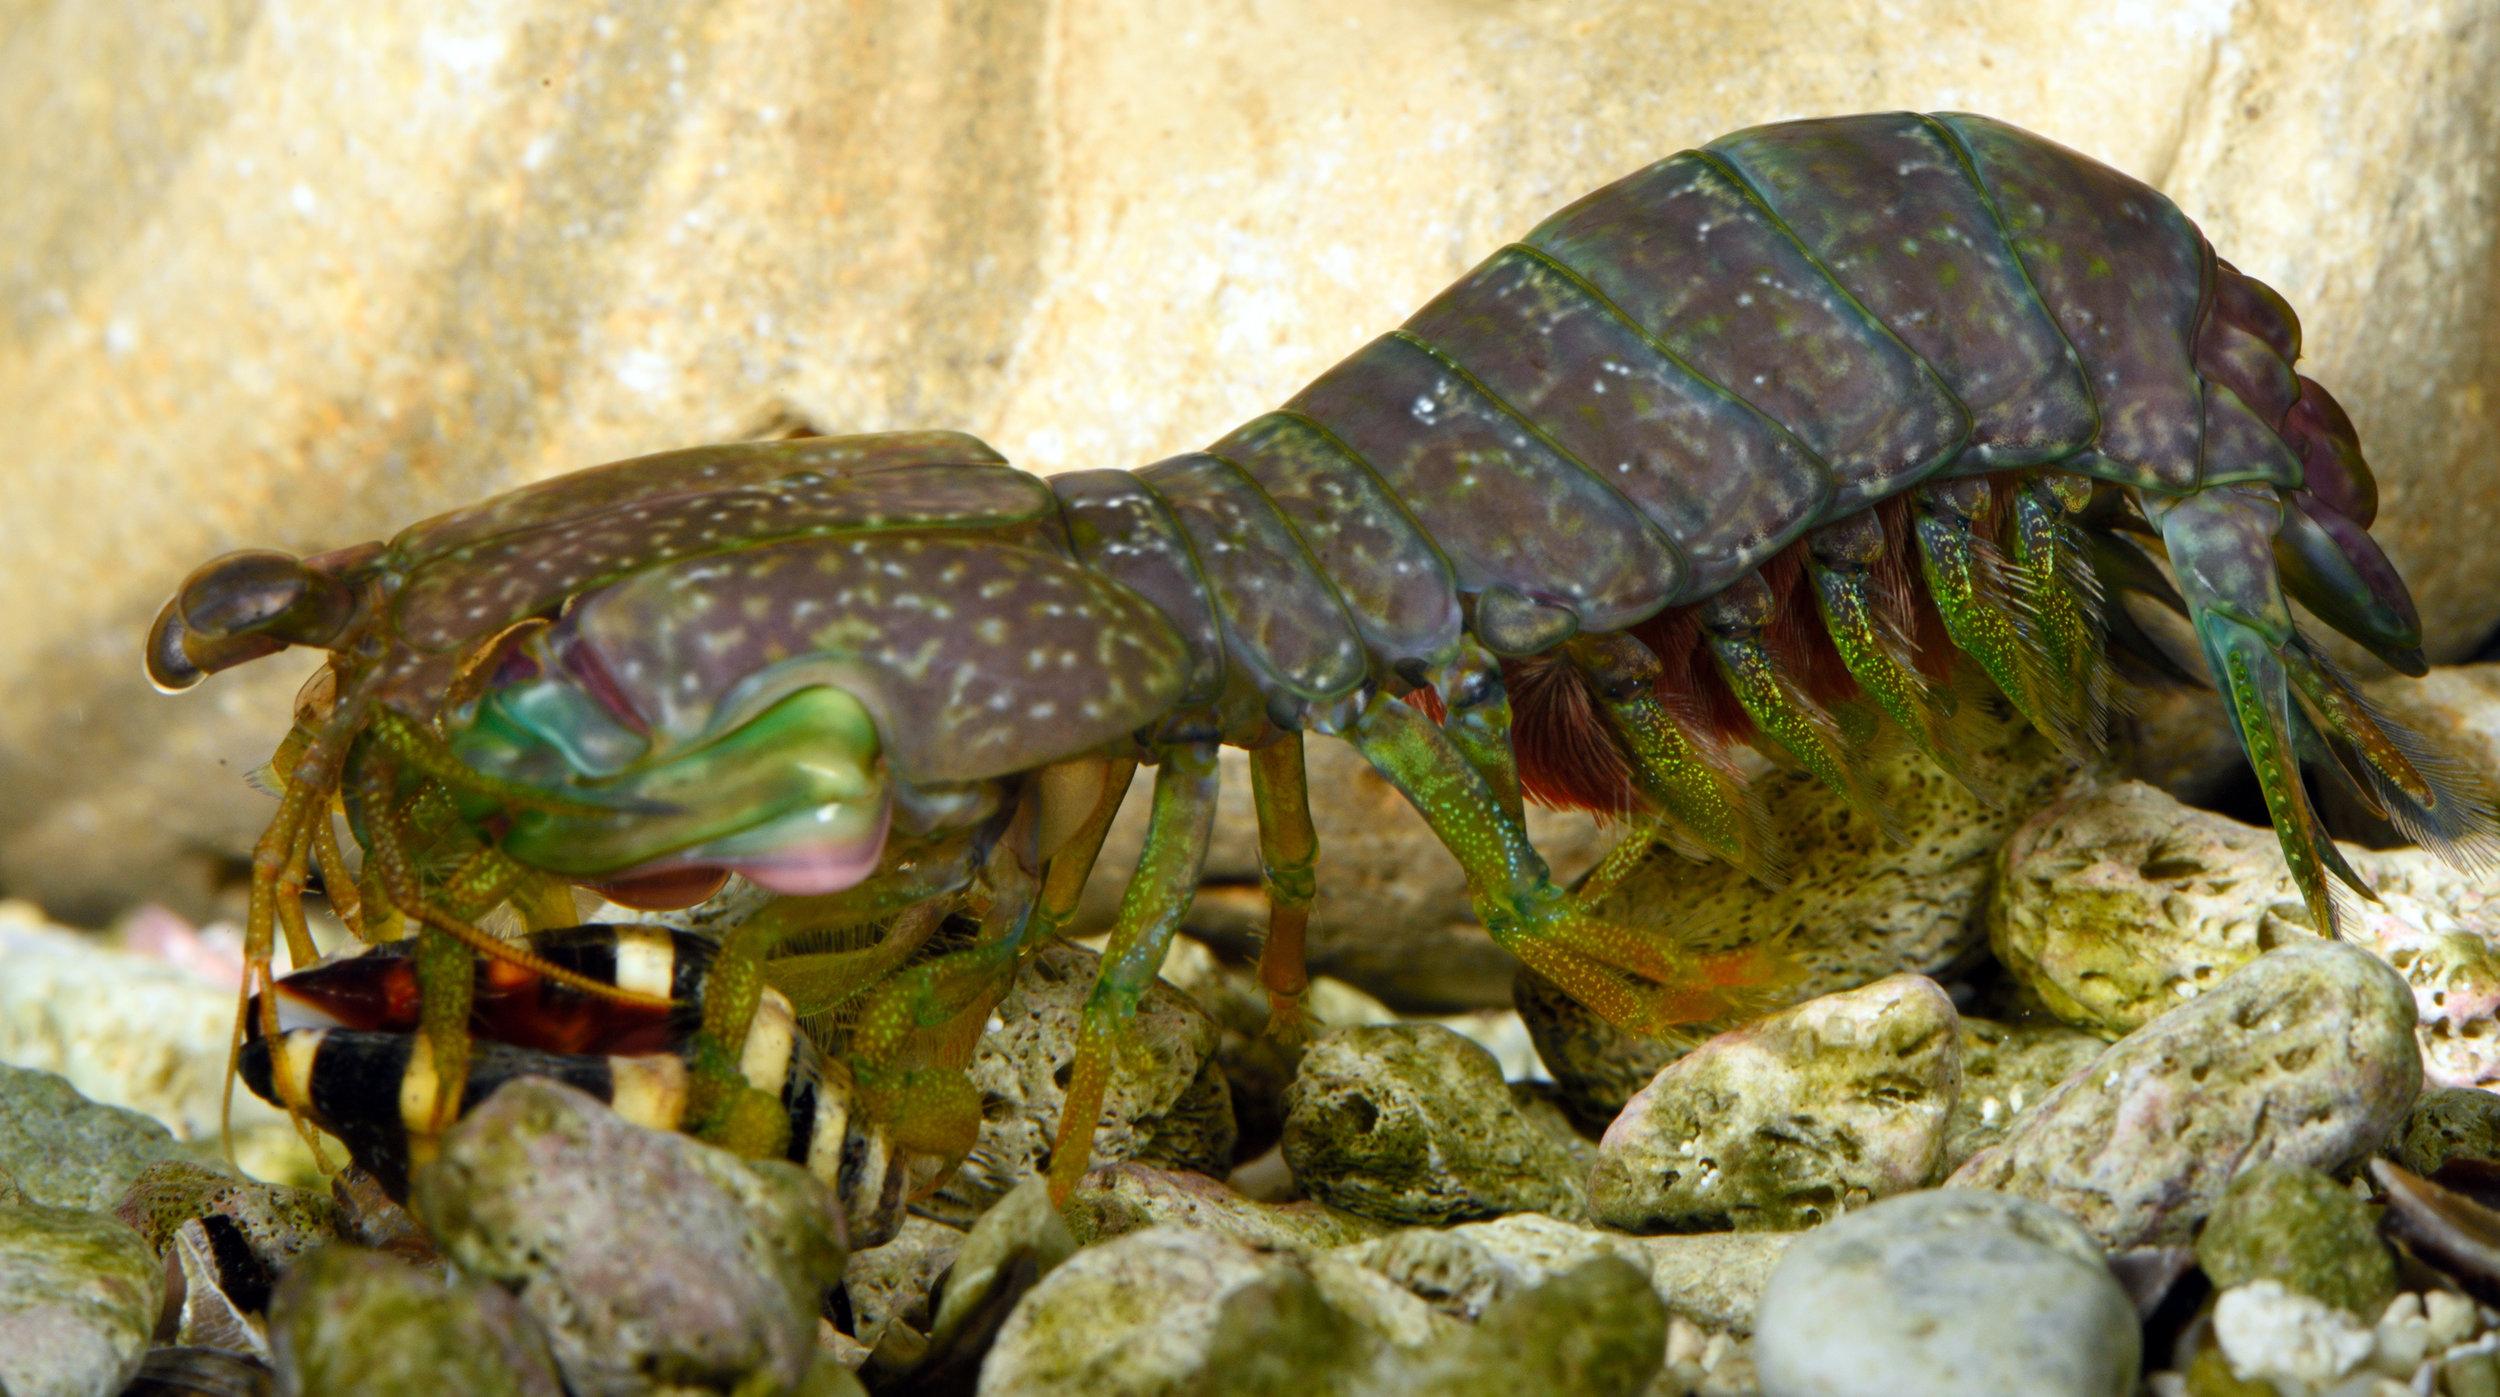 Neogonodactylus bredini smashing a snail.(Photo: Roy L. Caldwell)